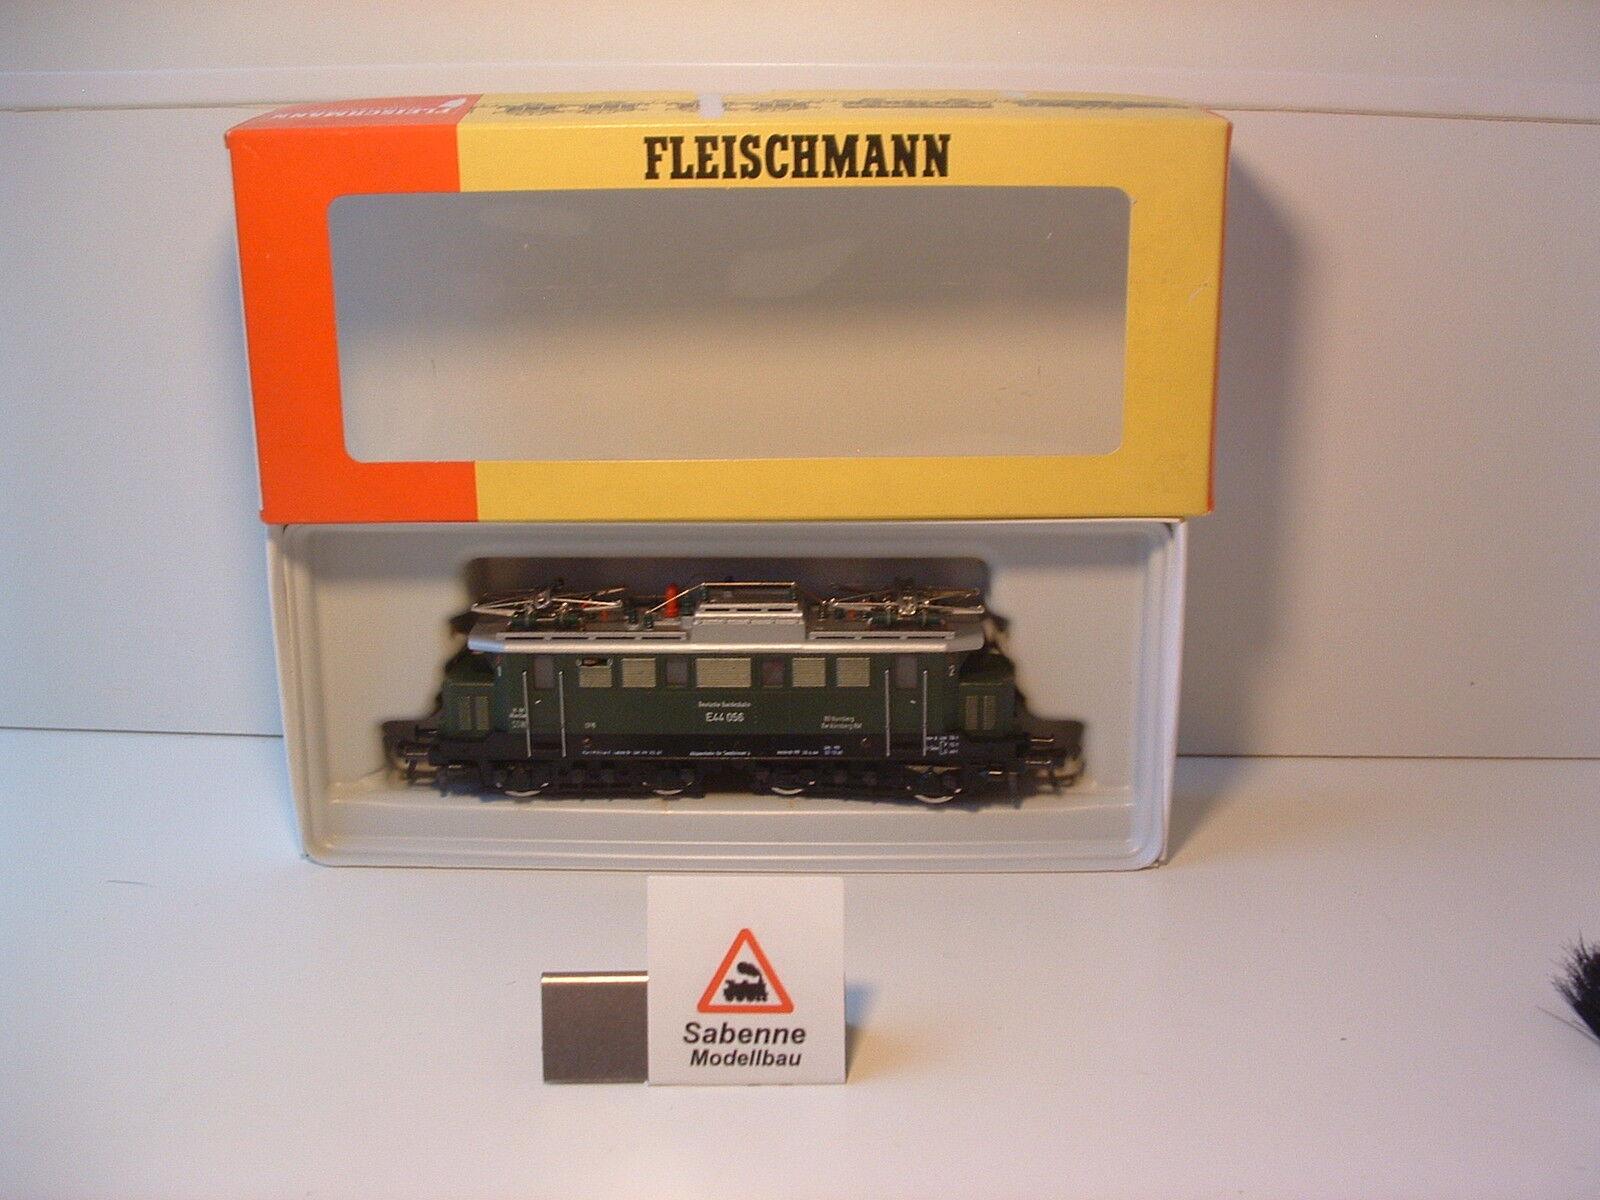 Fleischmann h0 4330 E-Lok BR e44 DB OVP m556 perfette condizioni